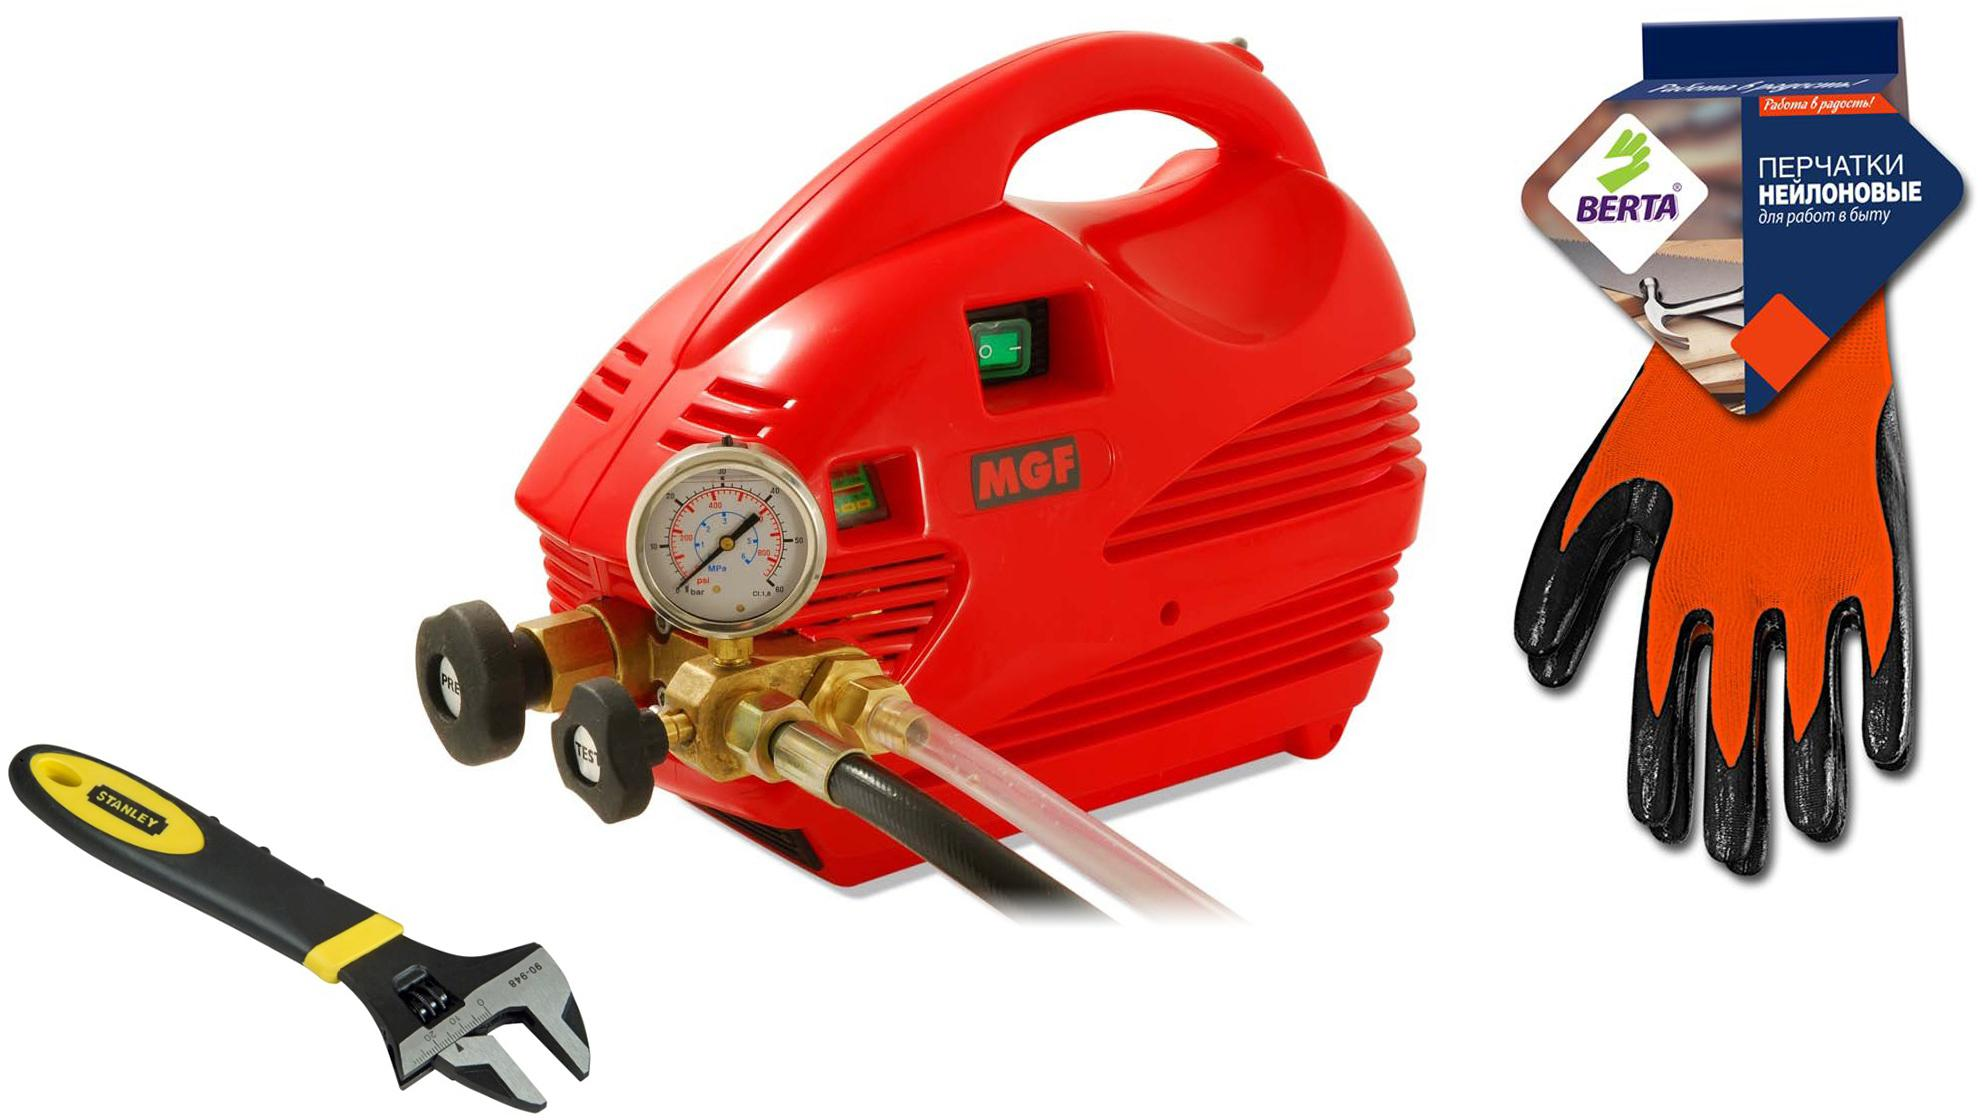 Набор Mgf Опрессовщик compact 60 905200 +Ключ maxsteel 0-90-948 (0 - 24 мм) +Перчатки 280